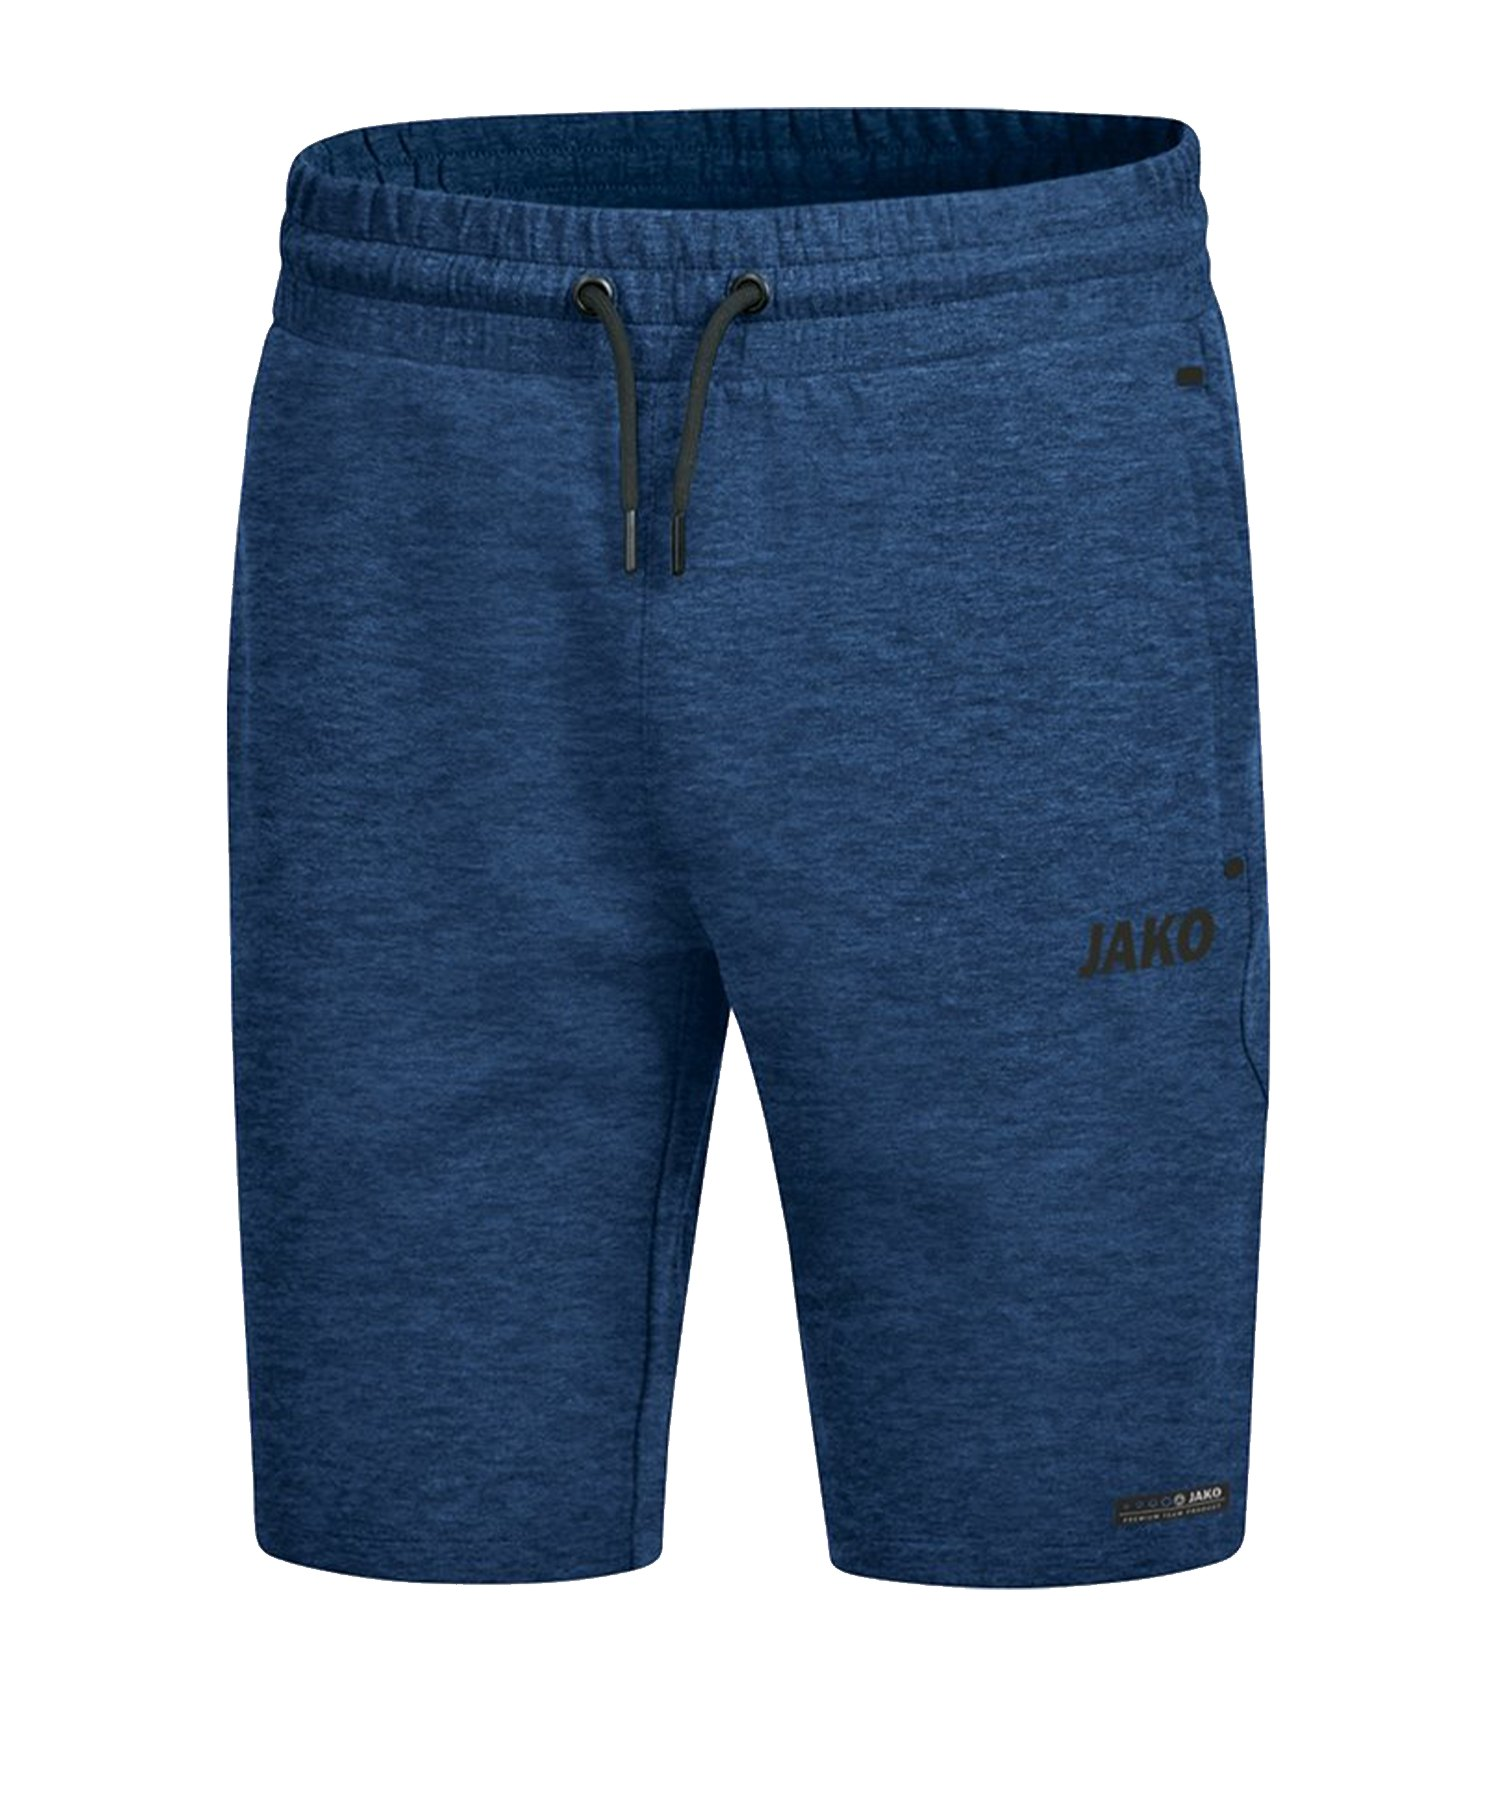 Jako Premium Basic Short Damen Blau F49 - blau